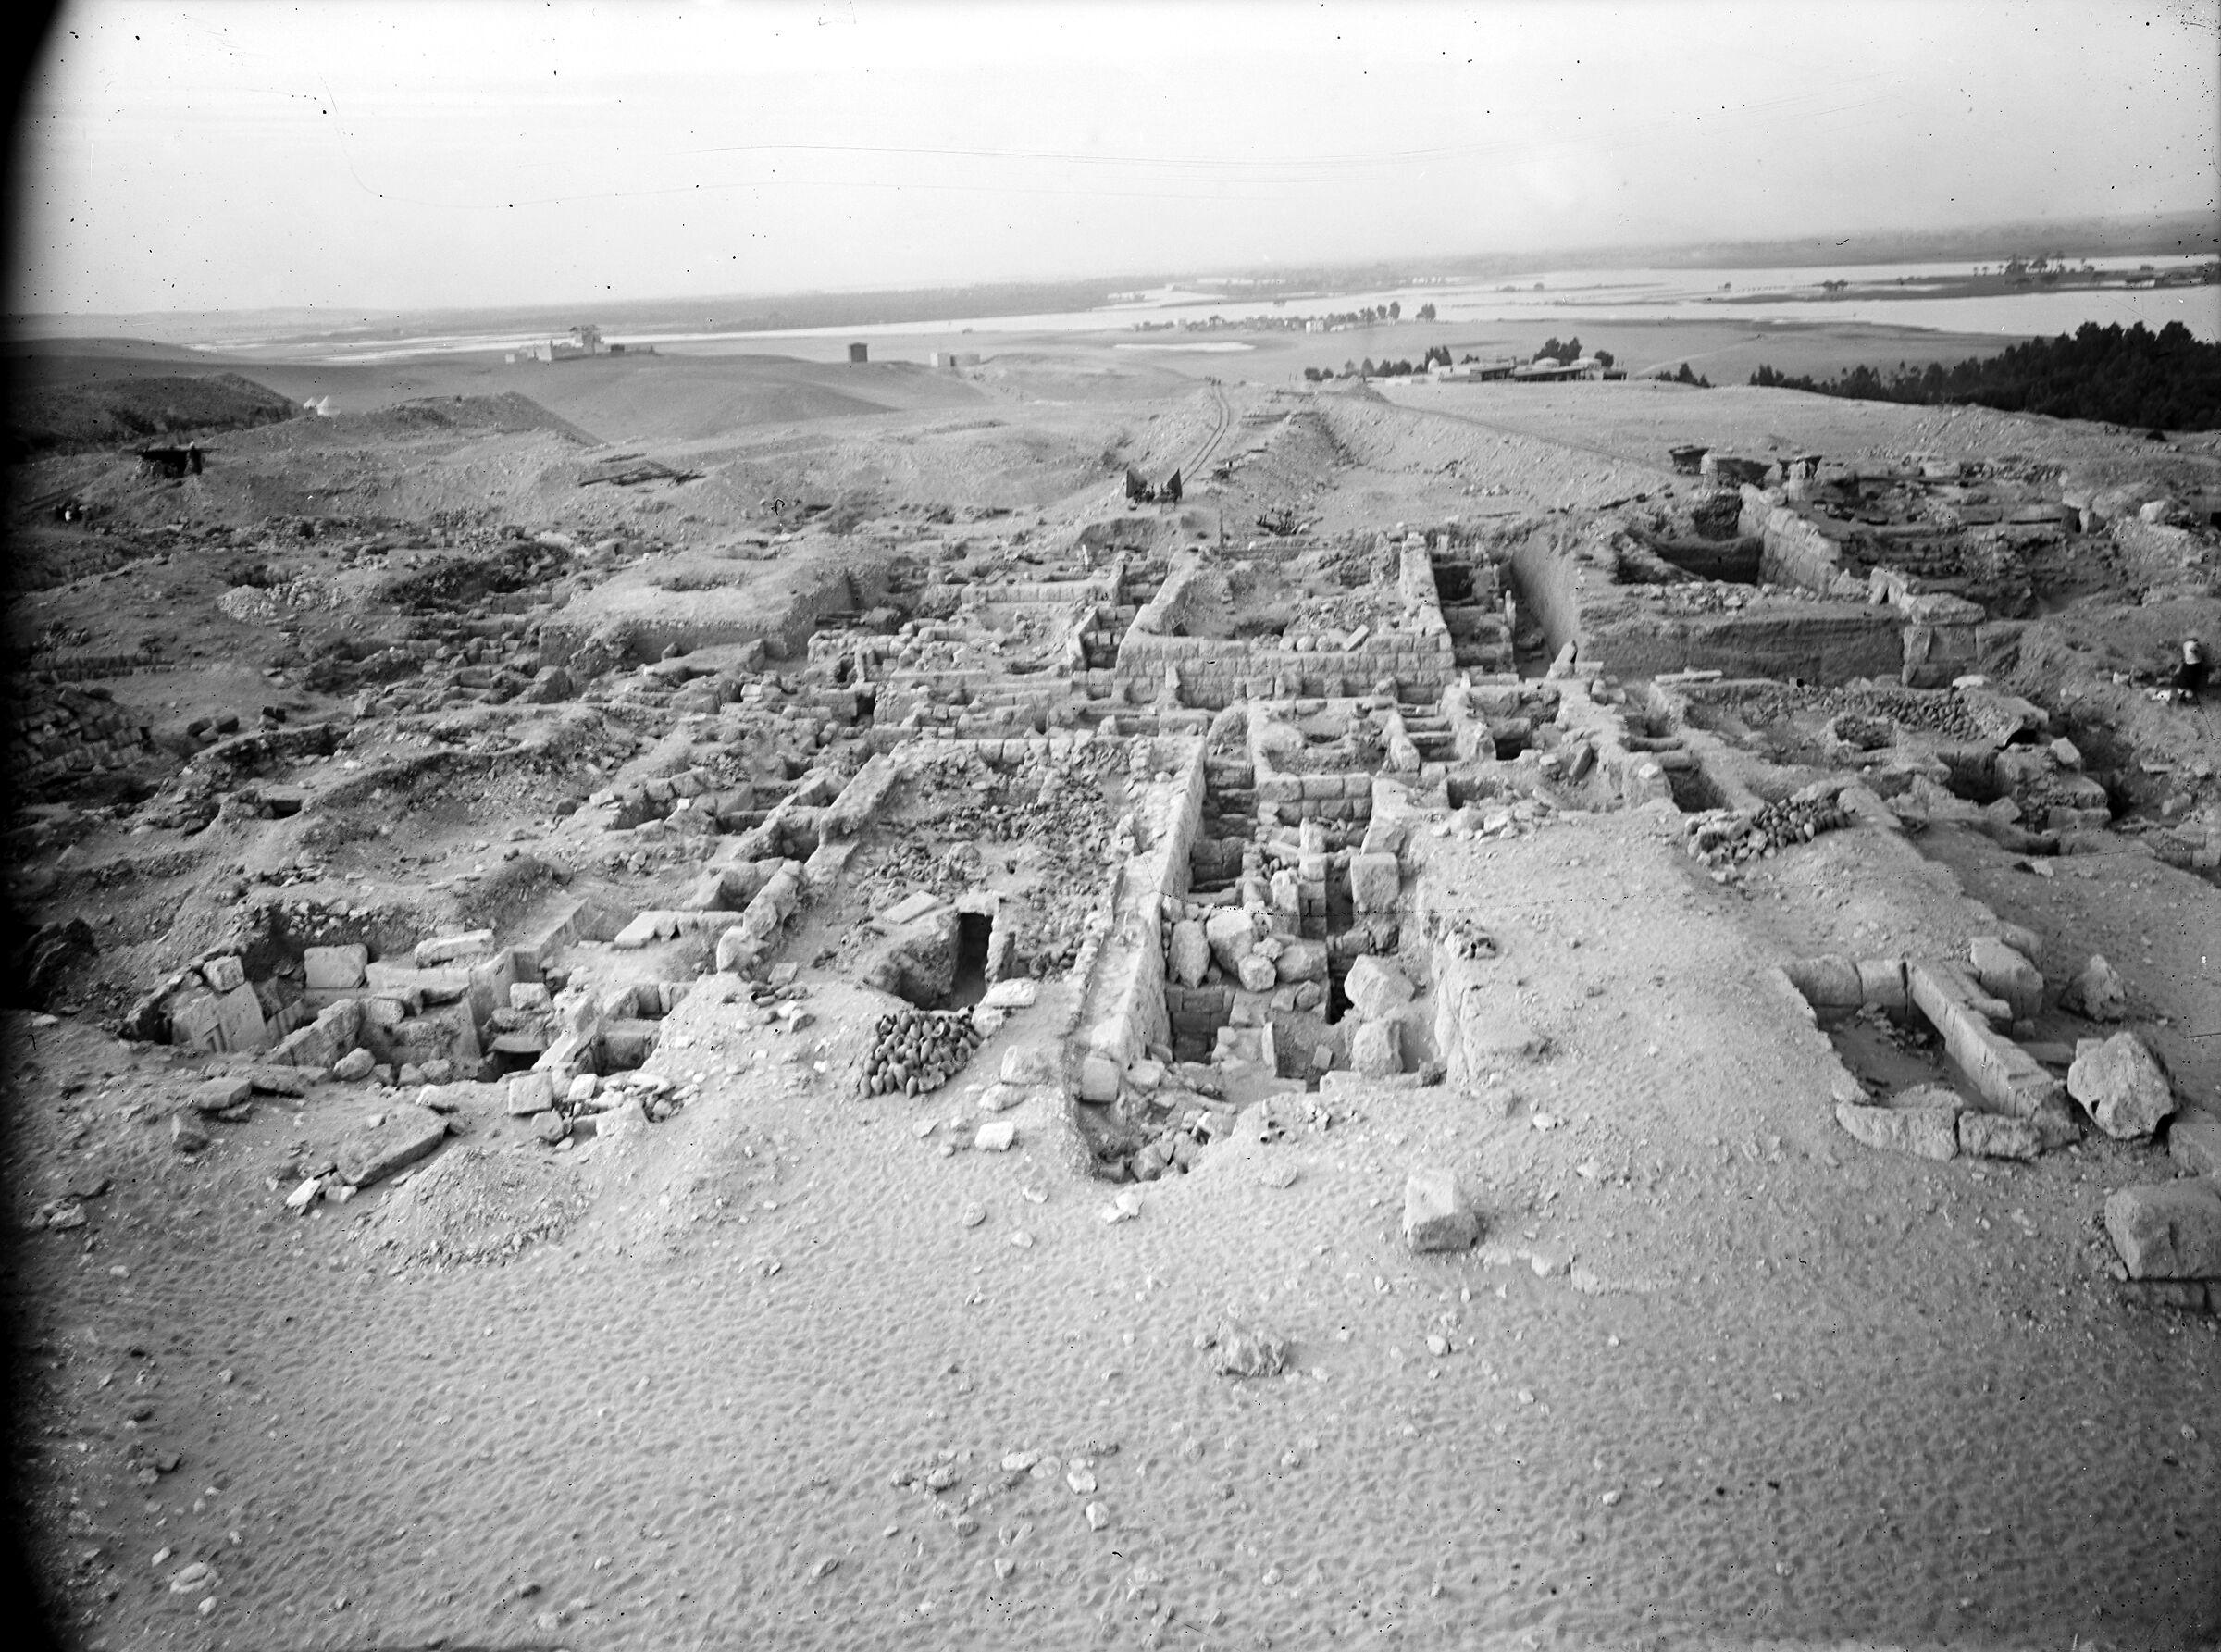 Western Cemetery: Site: Giza; View: G 2320 = G 5280, G 2330 = G 5380, G 2331, G 2332, G 2334, G 2340 = G 5480, G 2335, G 2336, G 2337, G 2352, G 2353, G 2360, G 2371